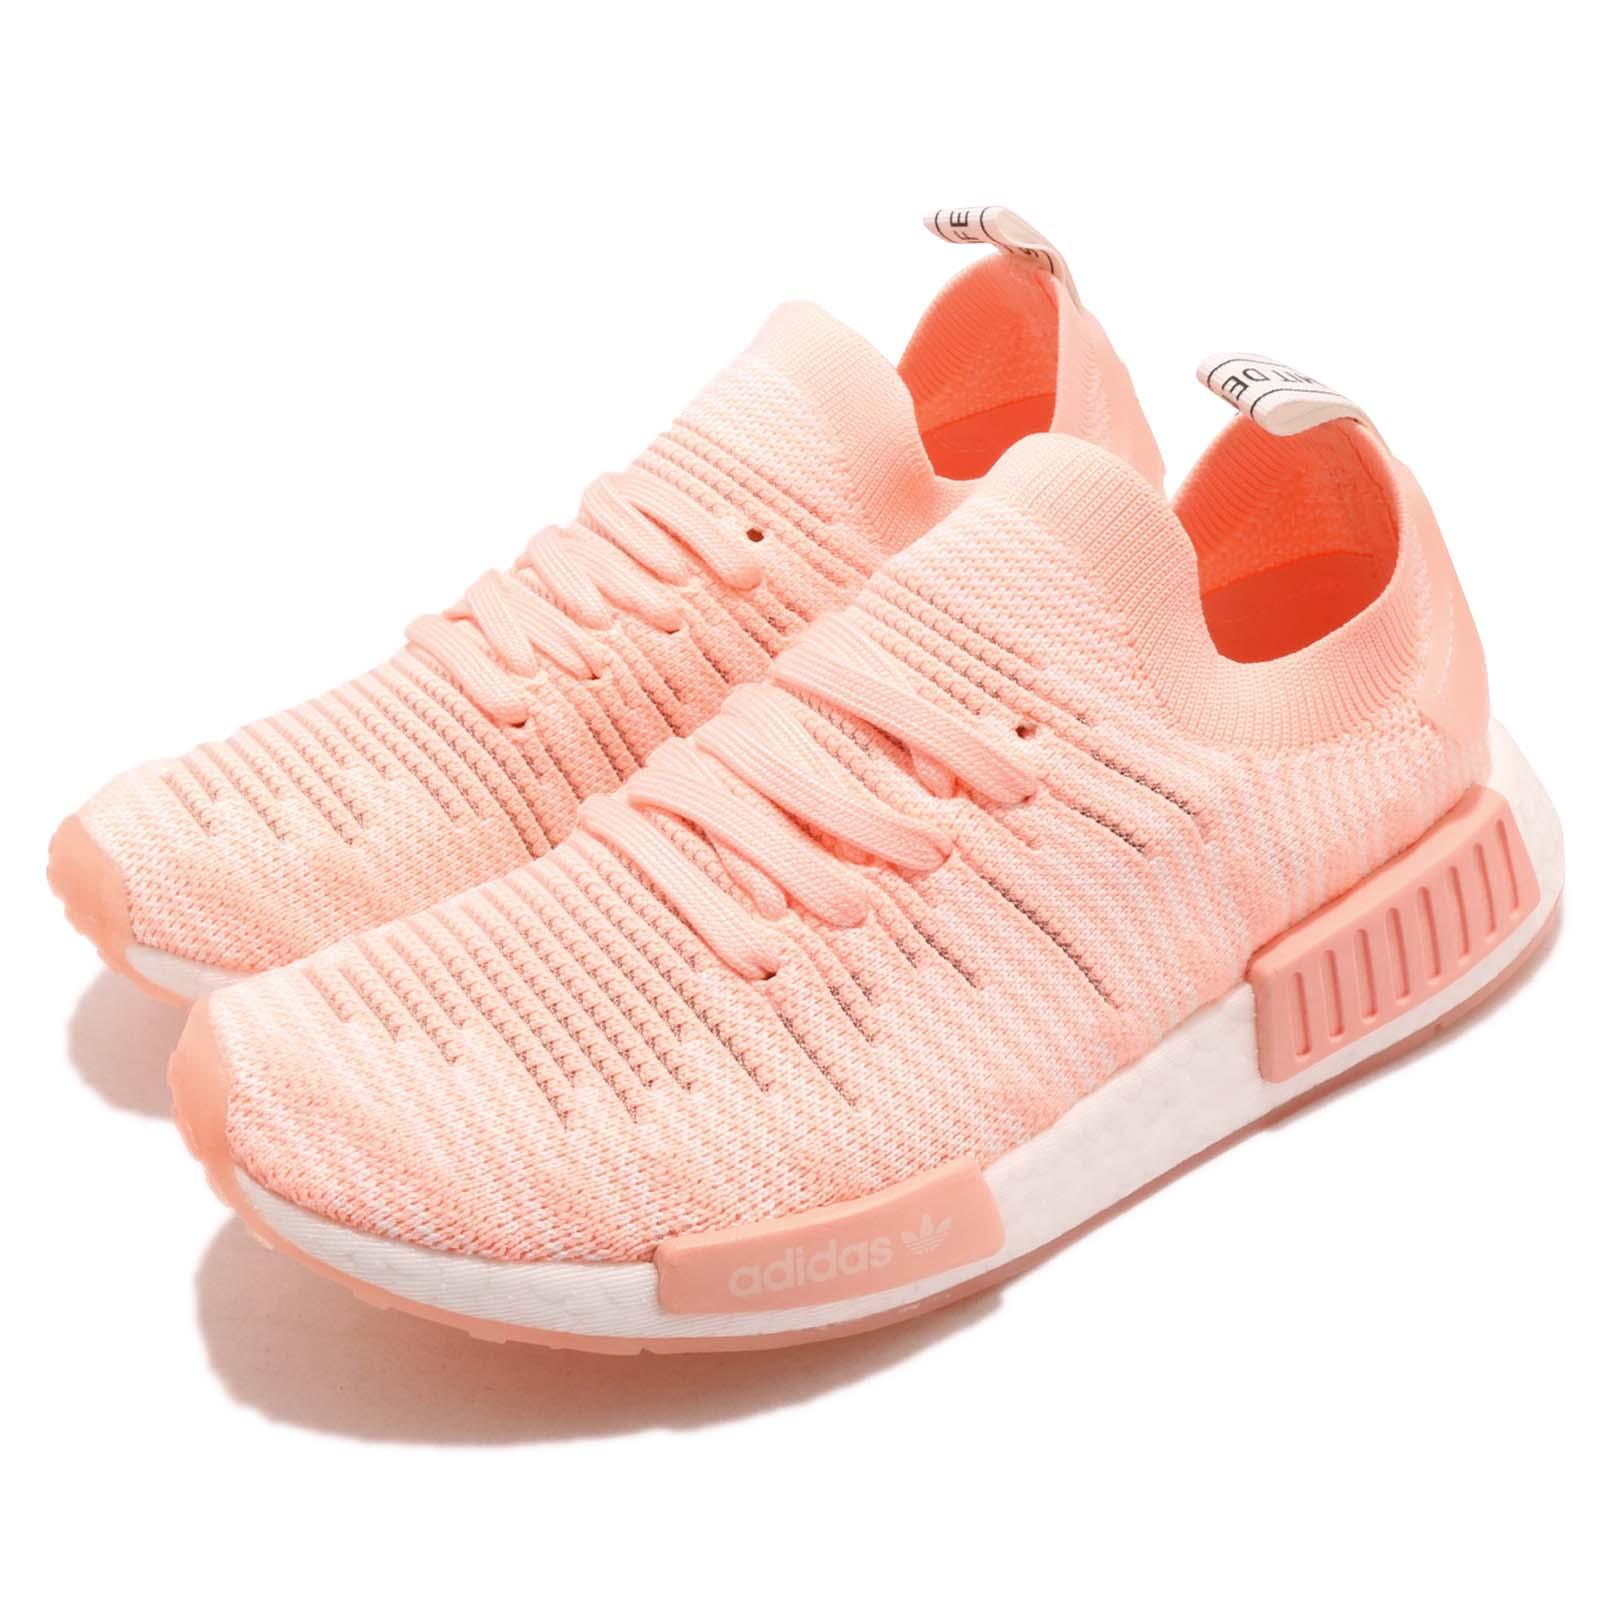 adidas 休閒鞋 NMD R1 STLT PK 女鞋 愛迪達 三葉草 襪套式 球鞋穿搭 粉橘 白 AQ1119 AQ1119-friDay購物